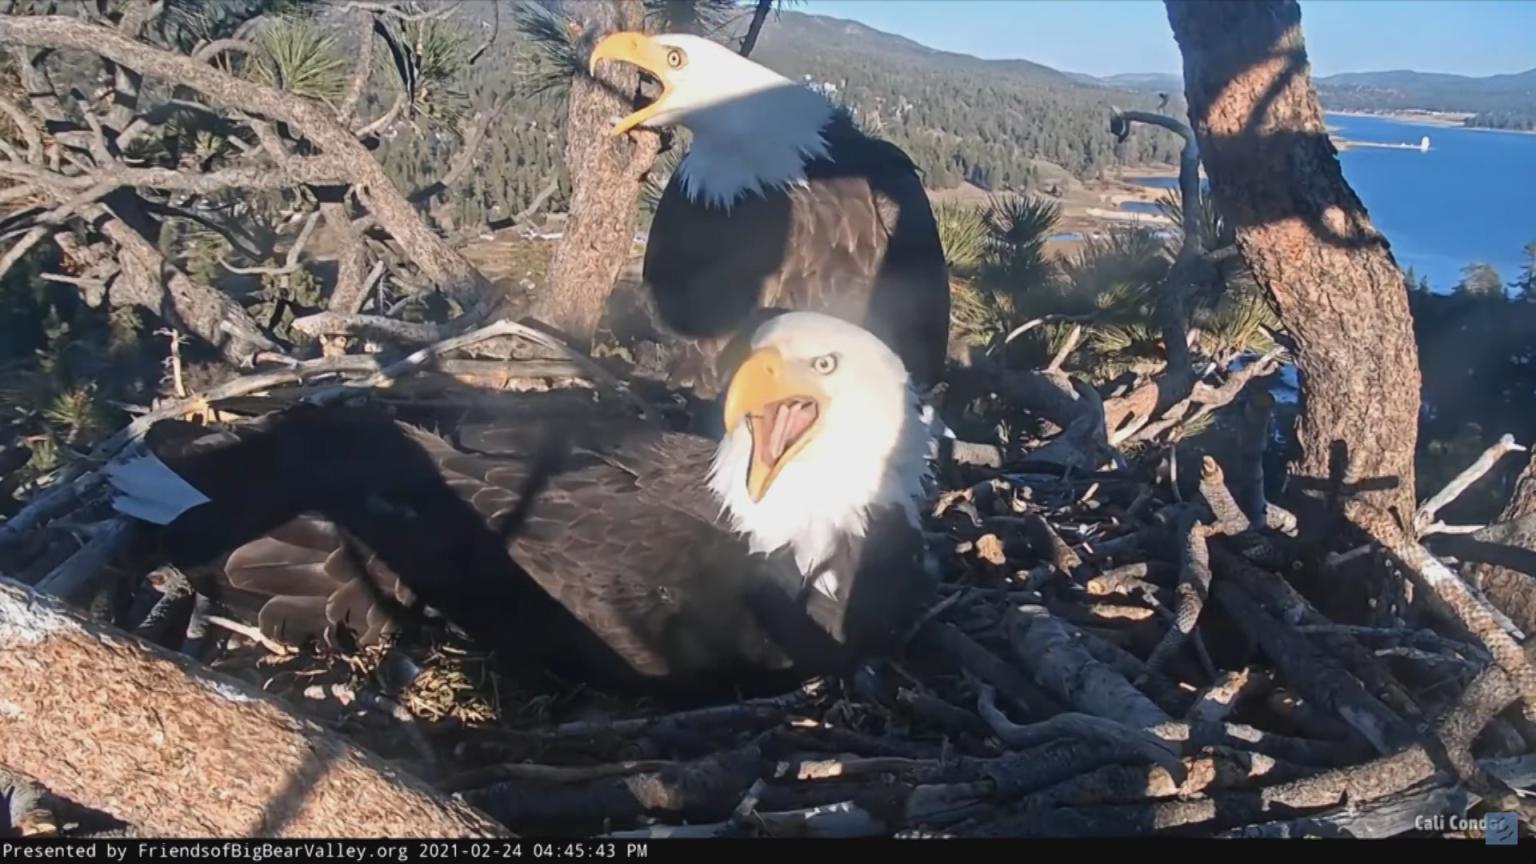 WATCH: Big Bear Bald Eagles scare off intruder